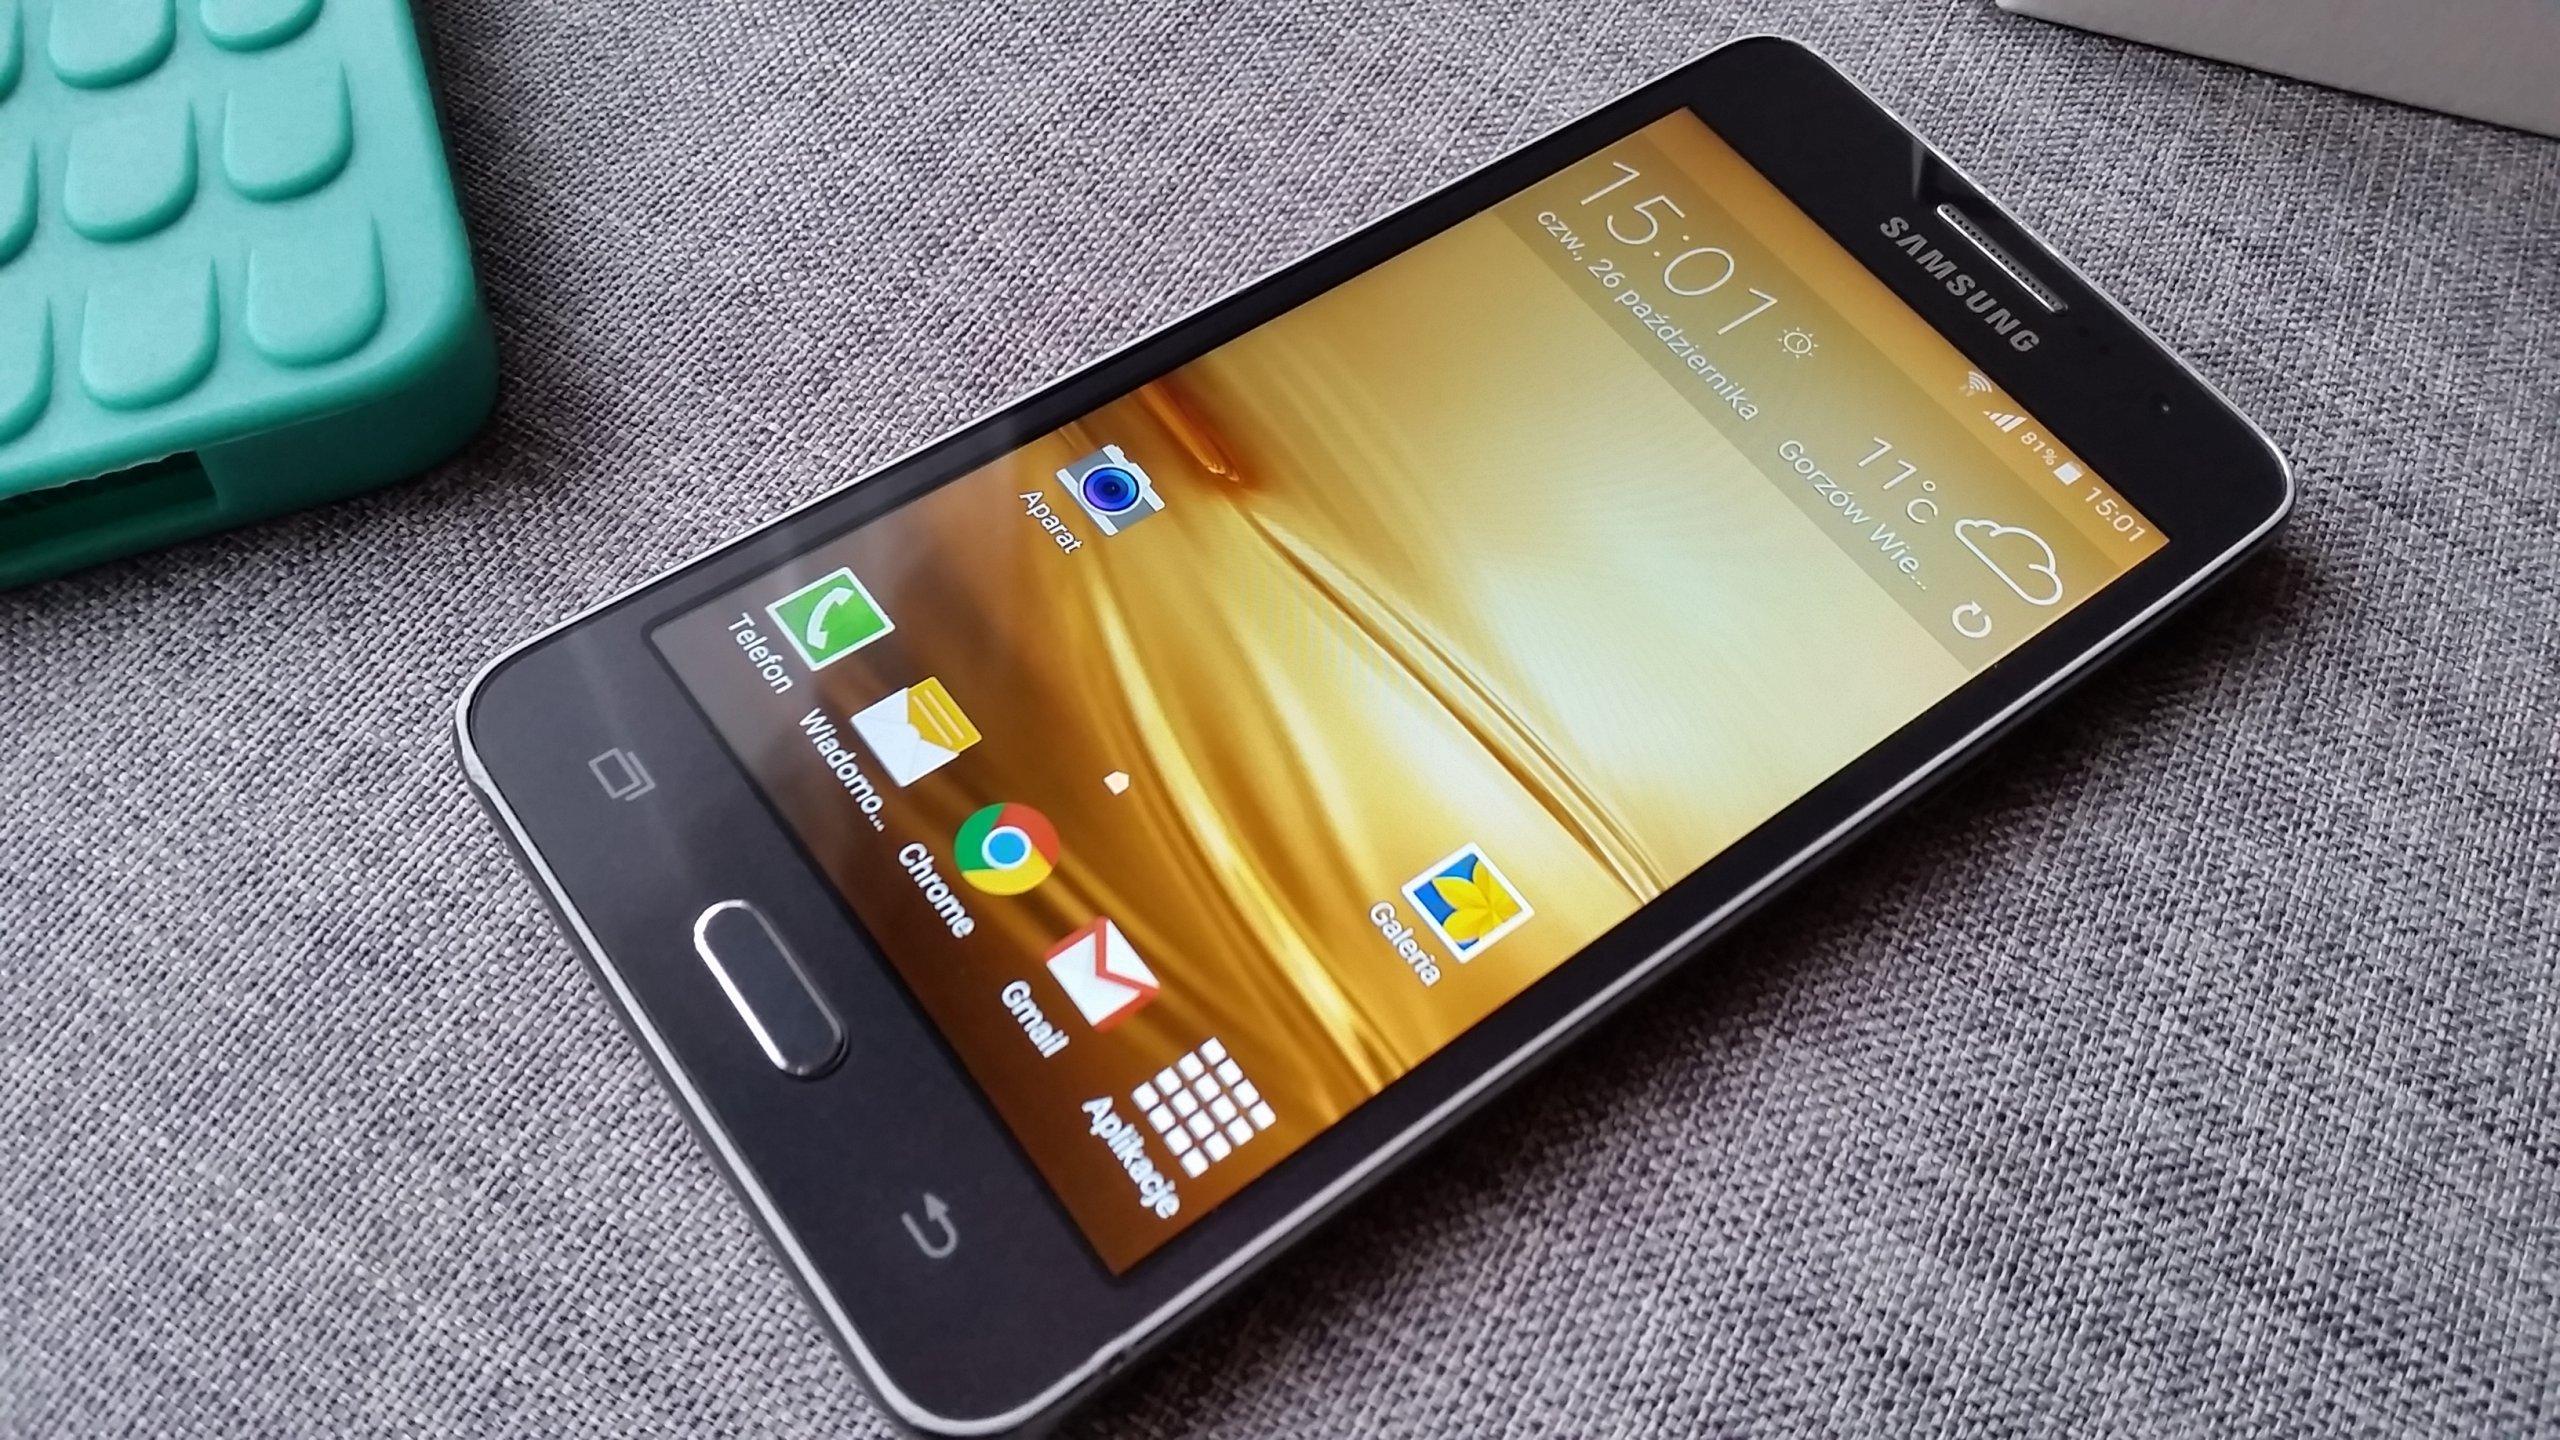 Samsung GRAND PRIME LTE 5 GPS 8Mpx KOMPLET